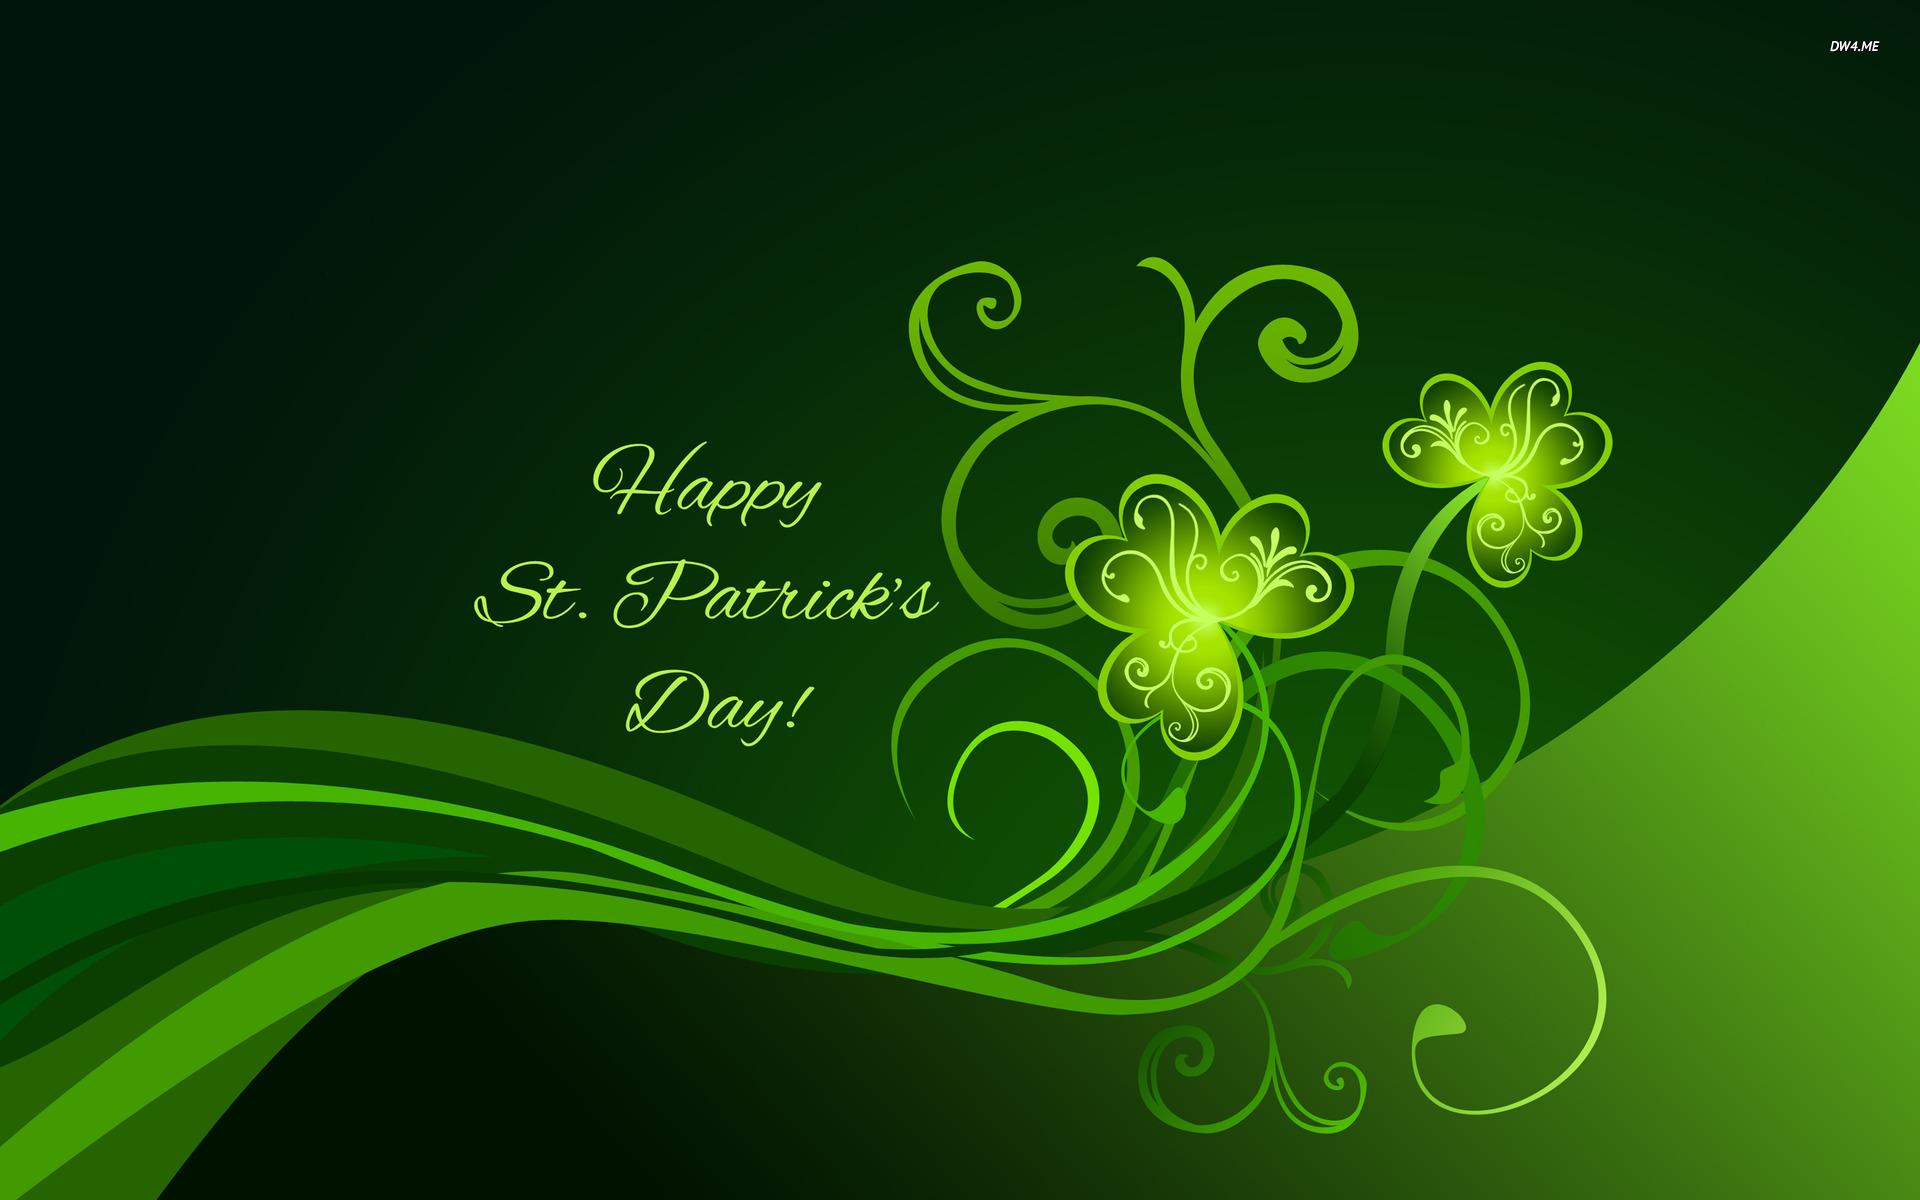 Happy Saint Patrick's Day! wallpaper - Holiday wallpapers ...